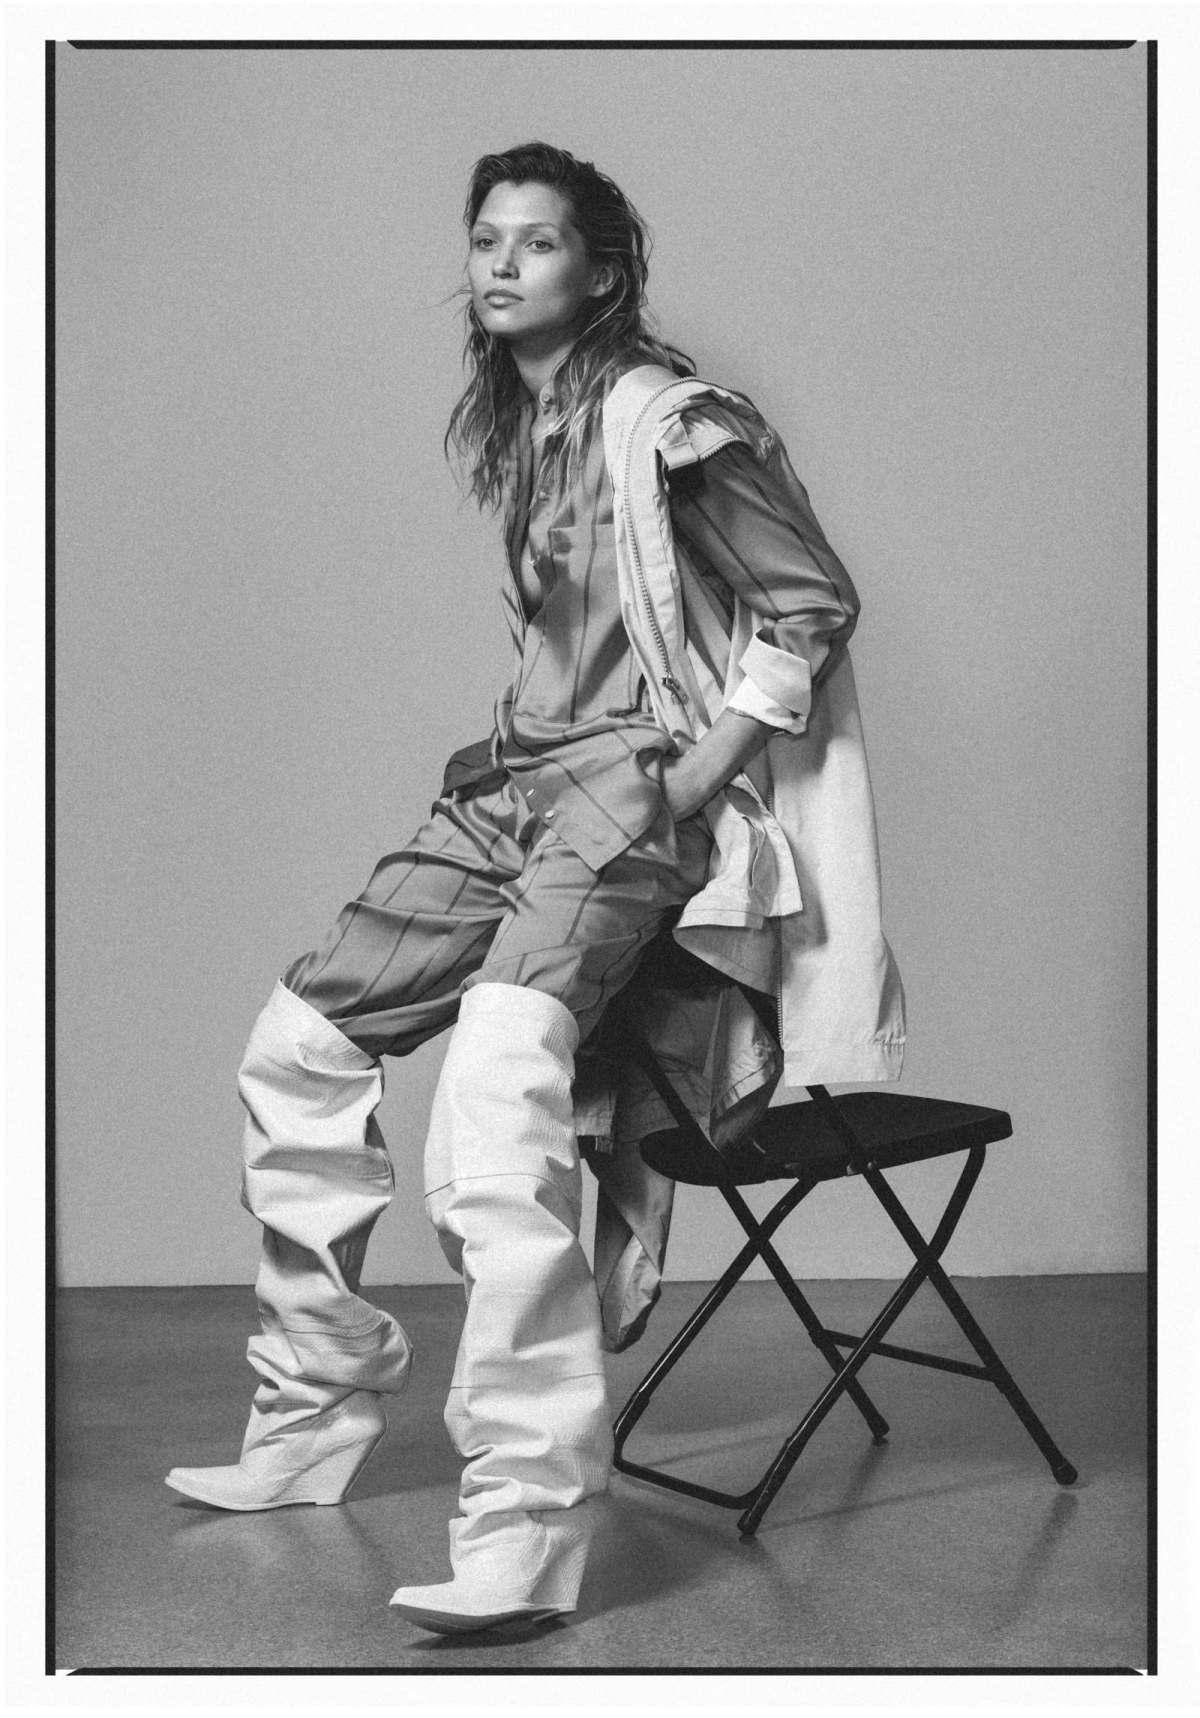 Hana Jirickova by Marco van Rijt for Vogue Ukraine